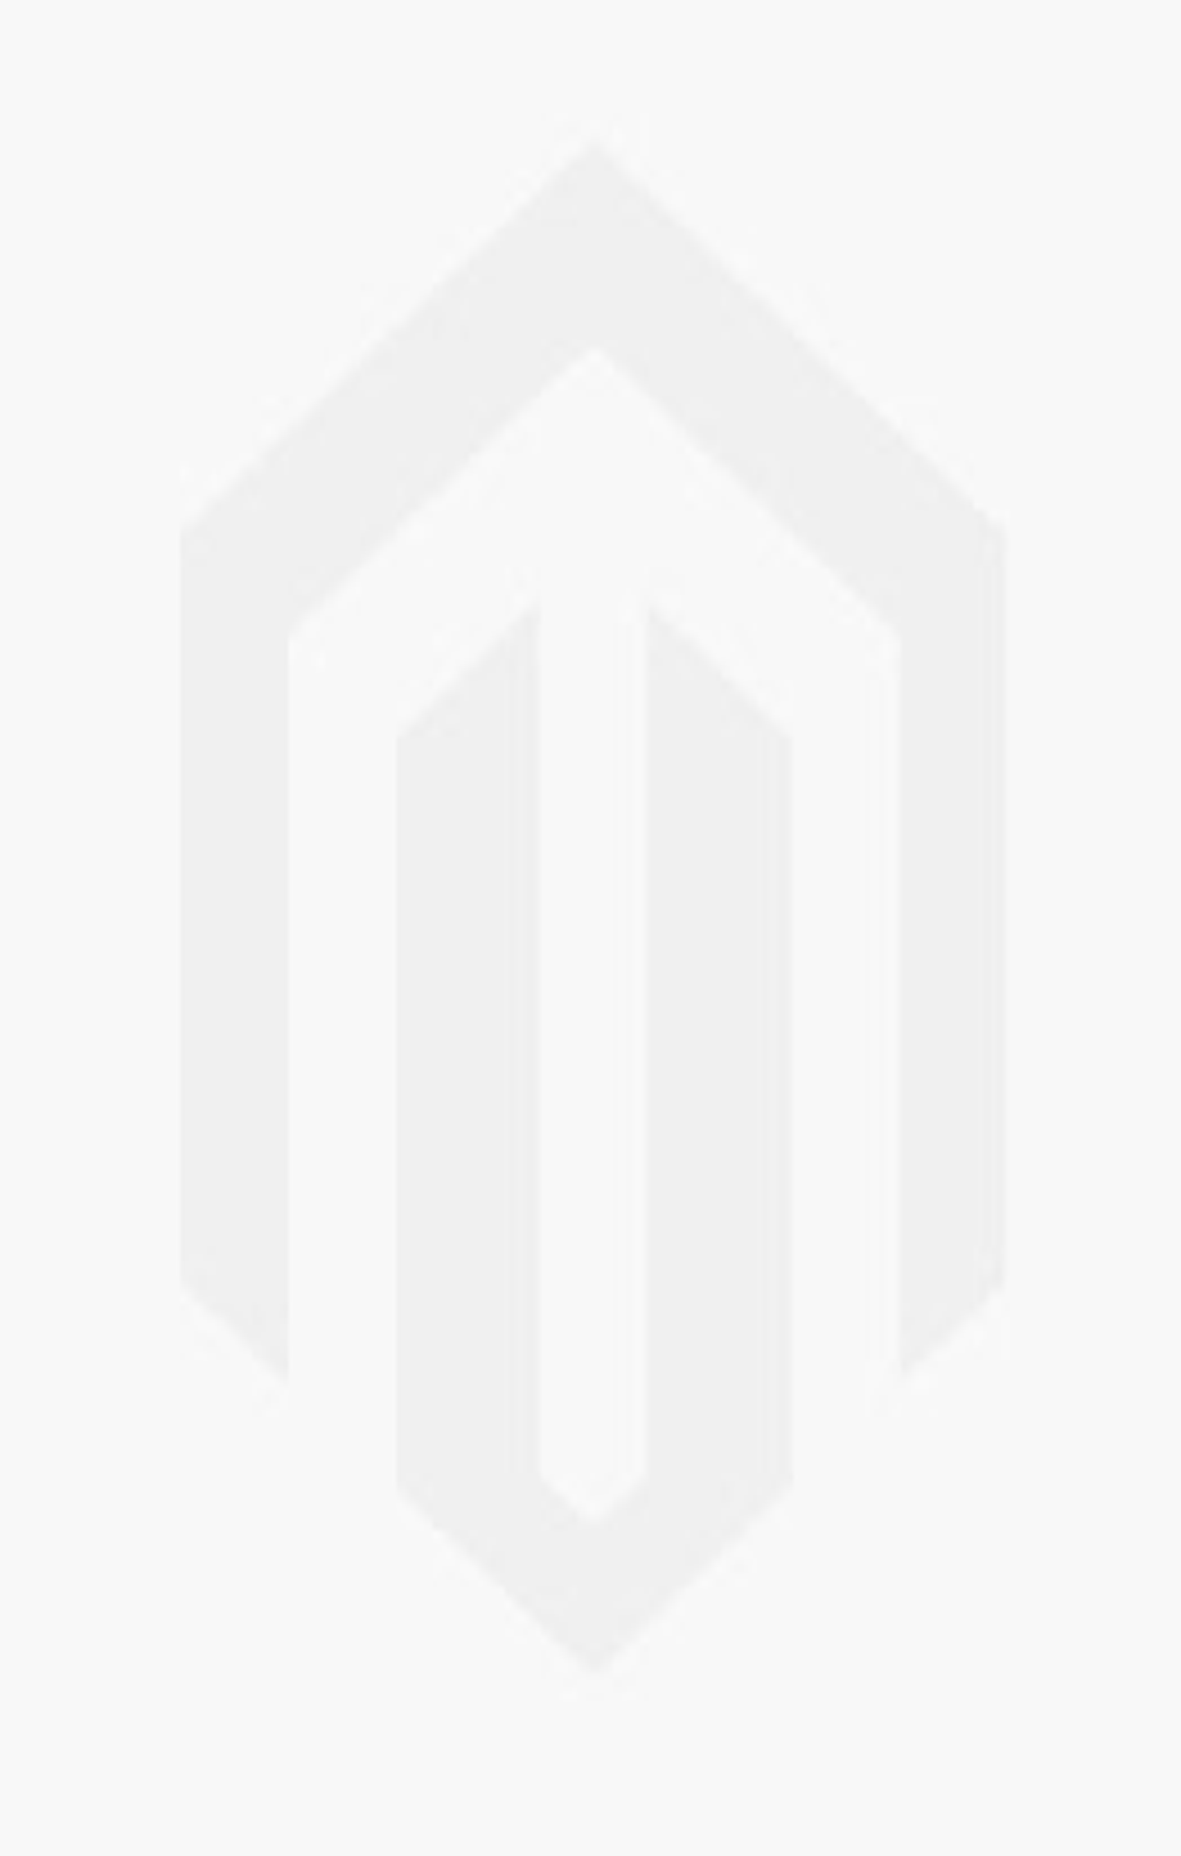 Agapanthus (Agapanthus Blauw) (BIO) 1 st.